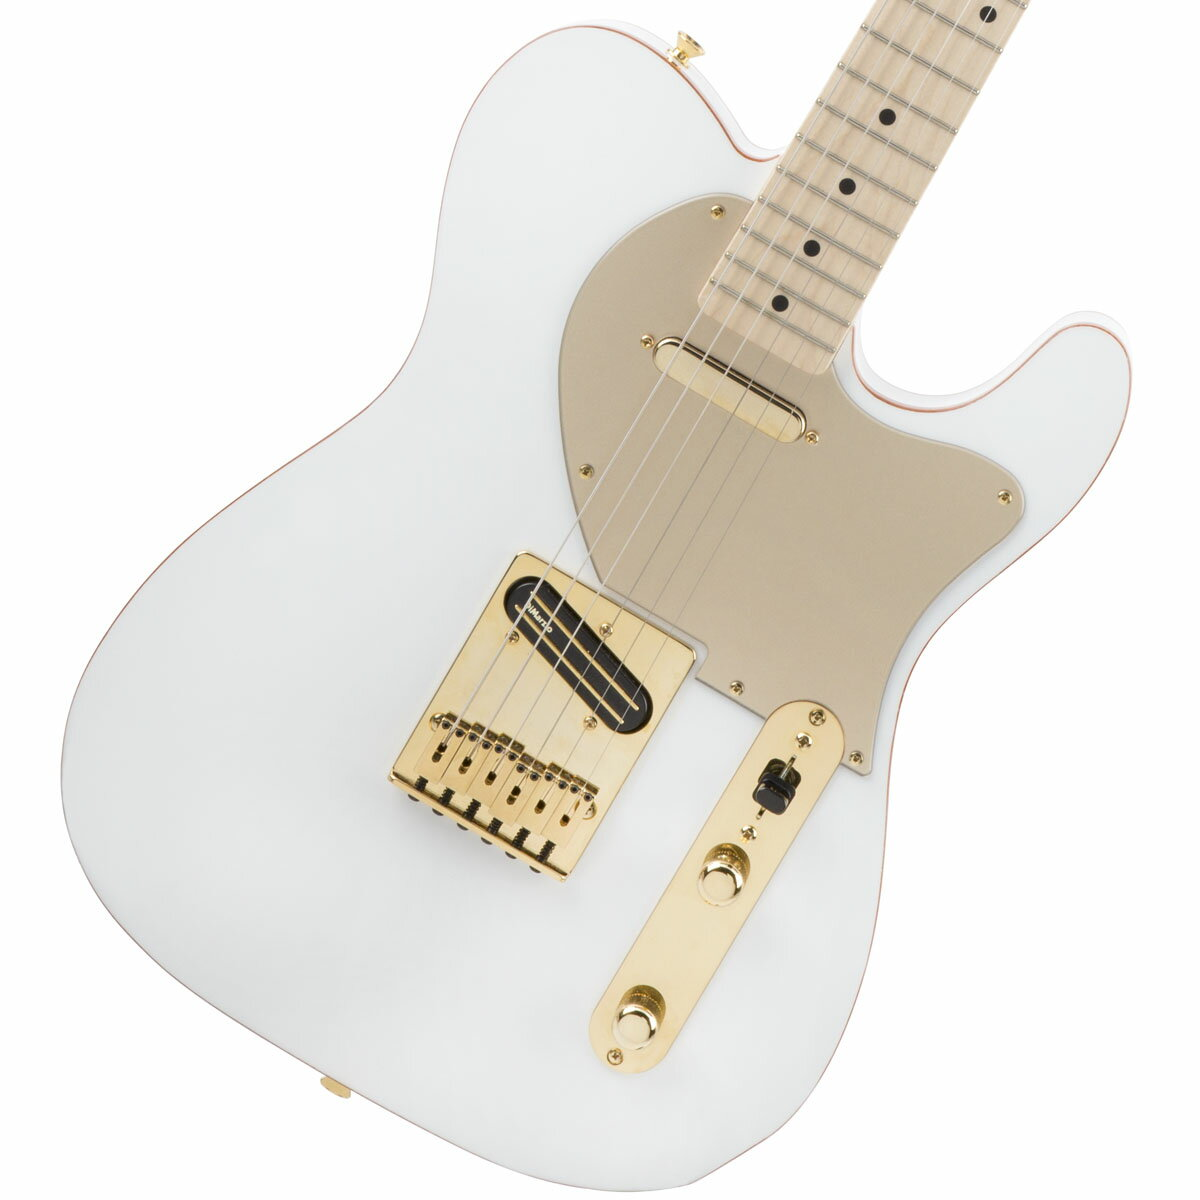 Fender / HARUNA TELECASTER Arctic White 《予約注文/納期未定》《カスタムショップのお手入れ用品を進呈/+671038200》【YRK】